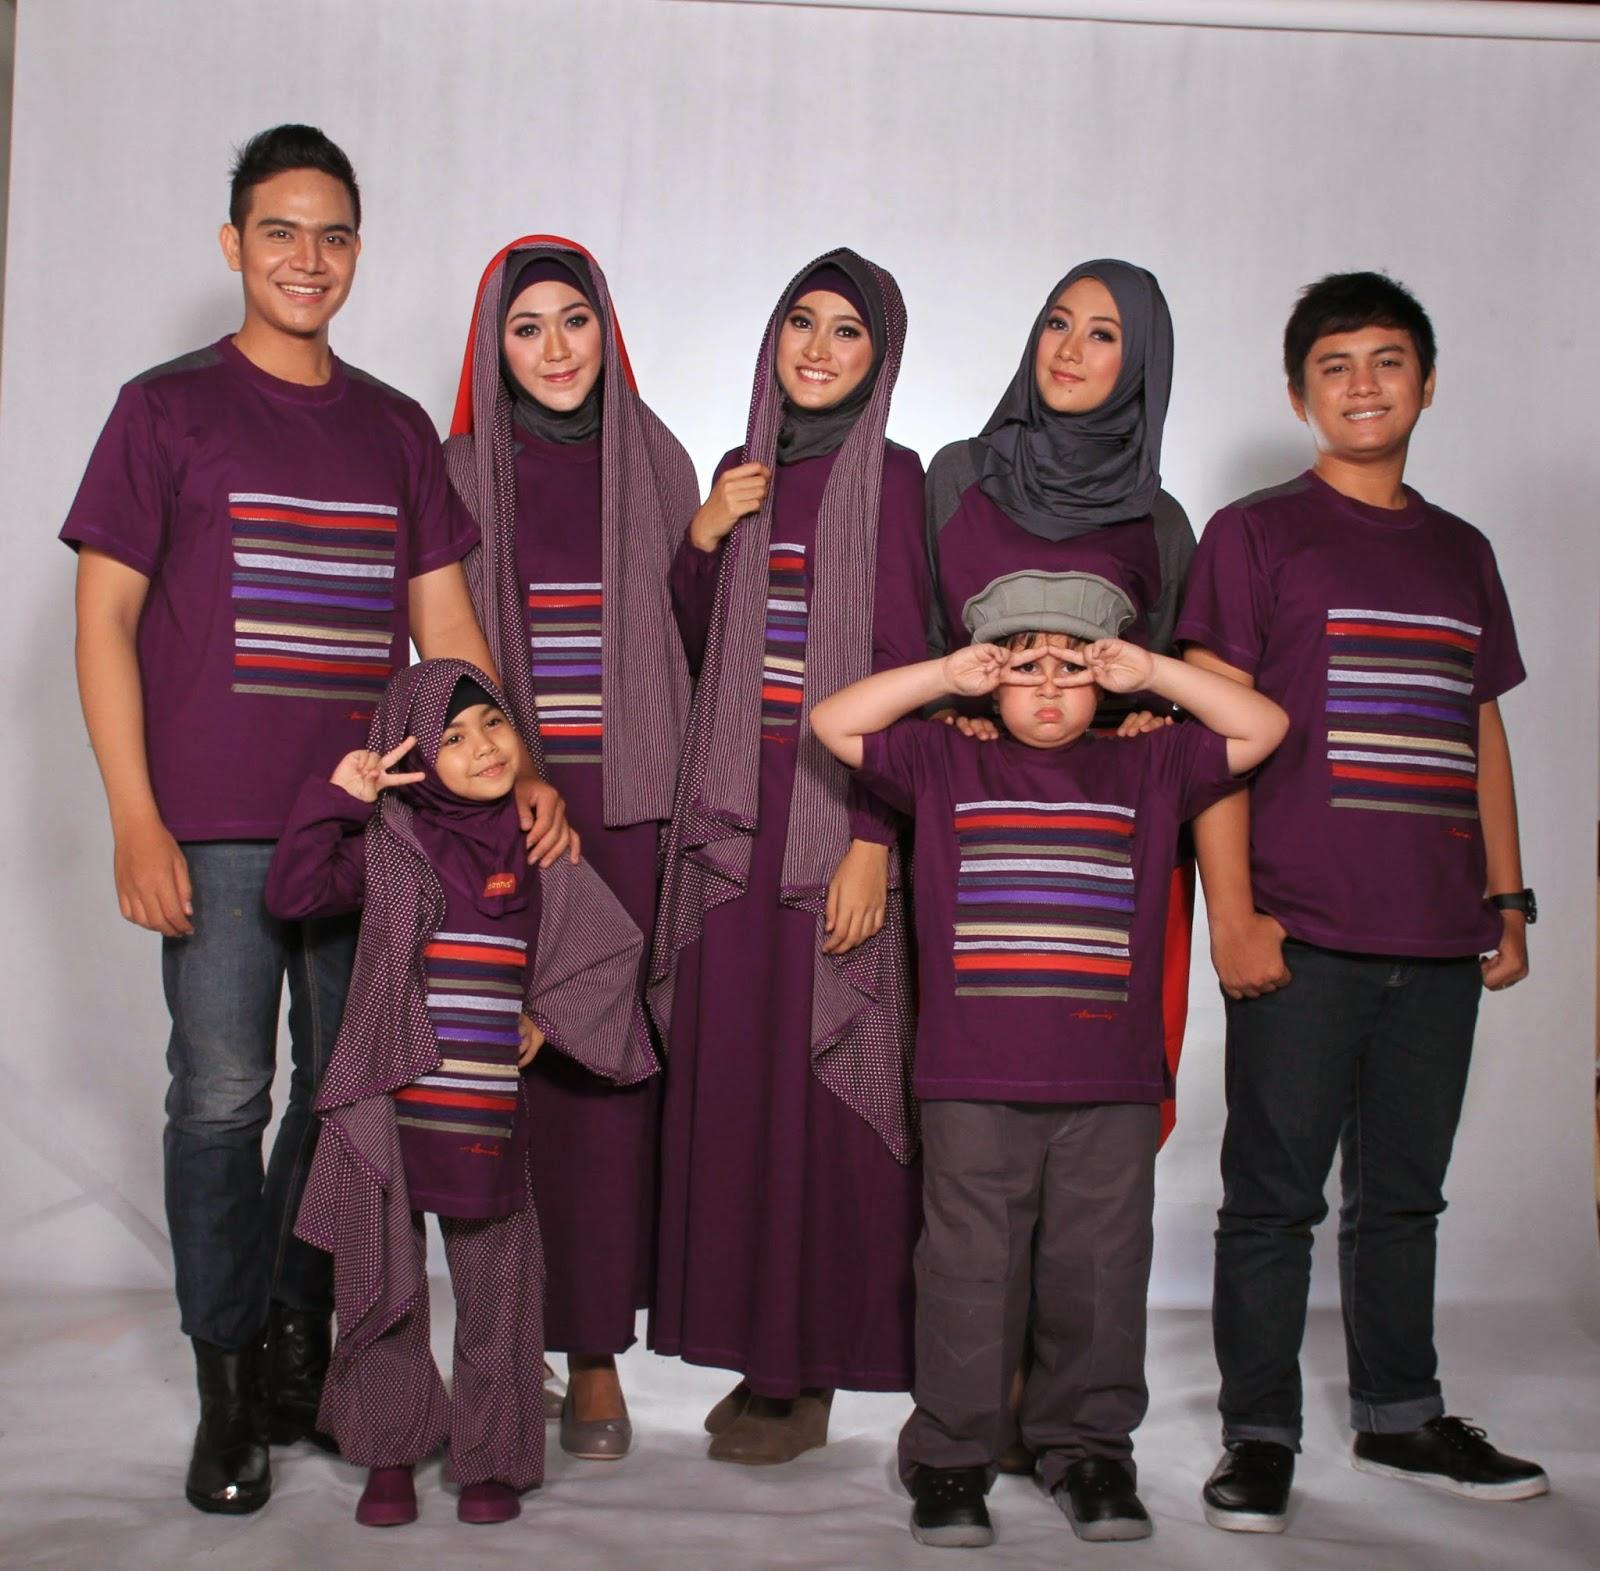 25 Model Baju Lebaran Keluarga 2018 Kompak Modis Pesta Couple Modern